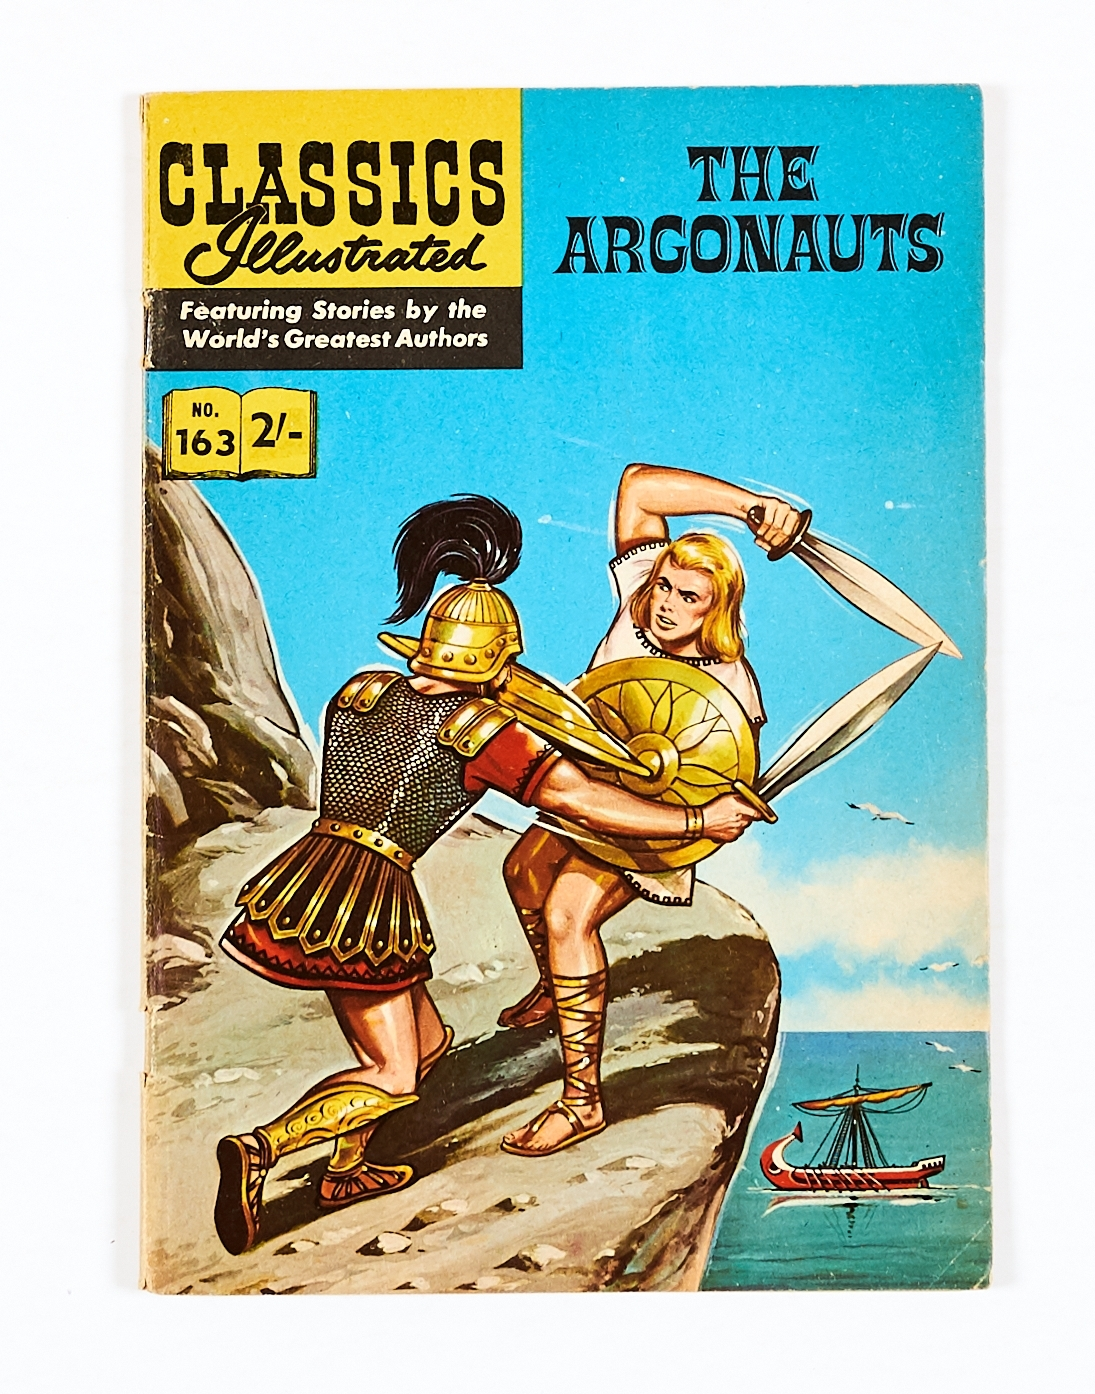 Lot 48 - Classics Illustrated 163: The Argonauts (1950s) HRN 157. Only this scarce UK originated art